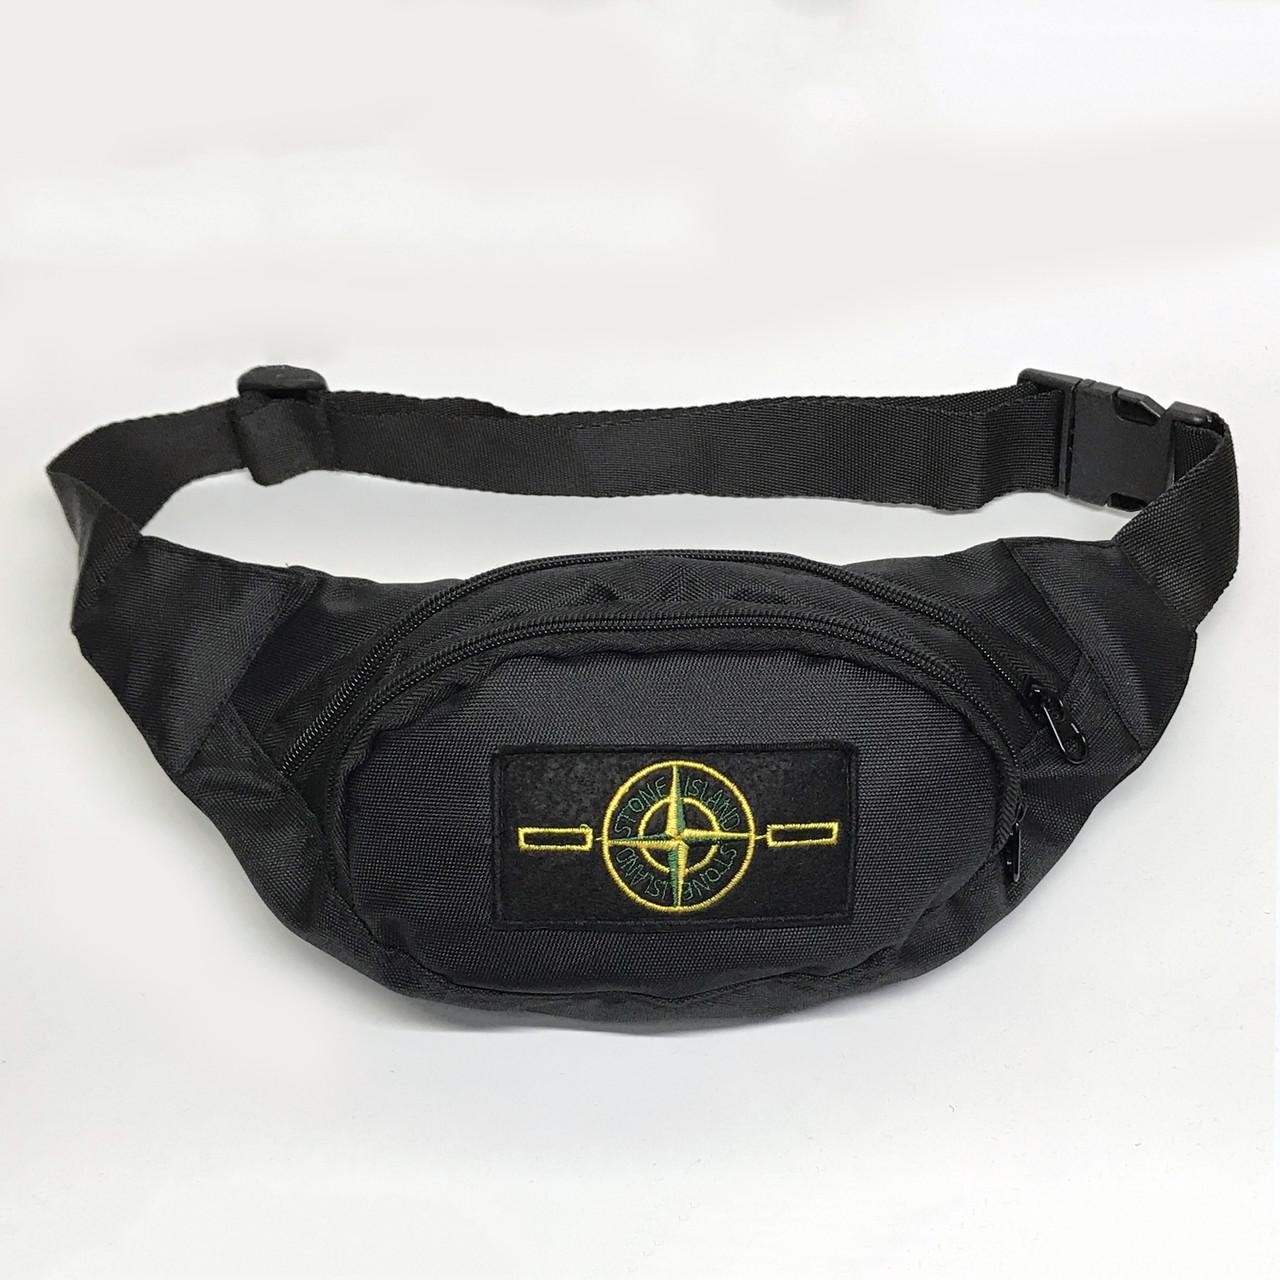 Поясная сумка в стиле Stone Island черная